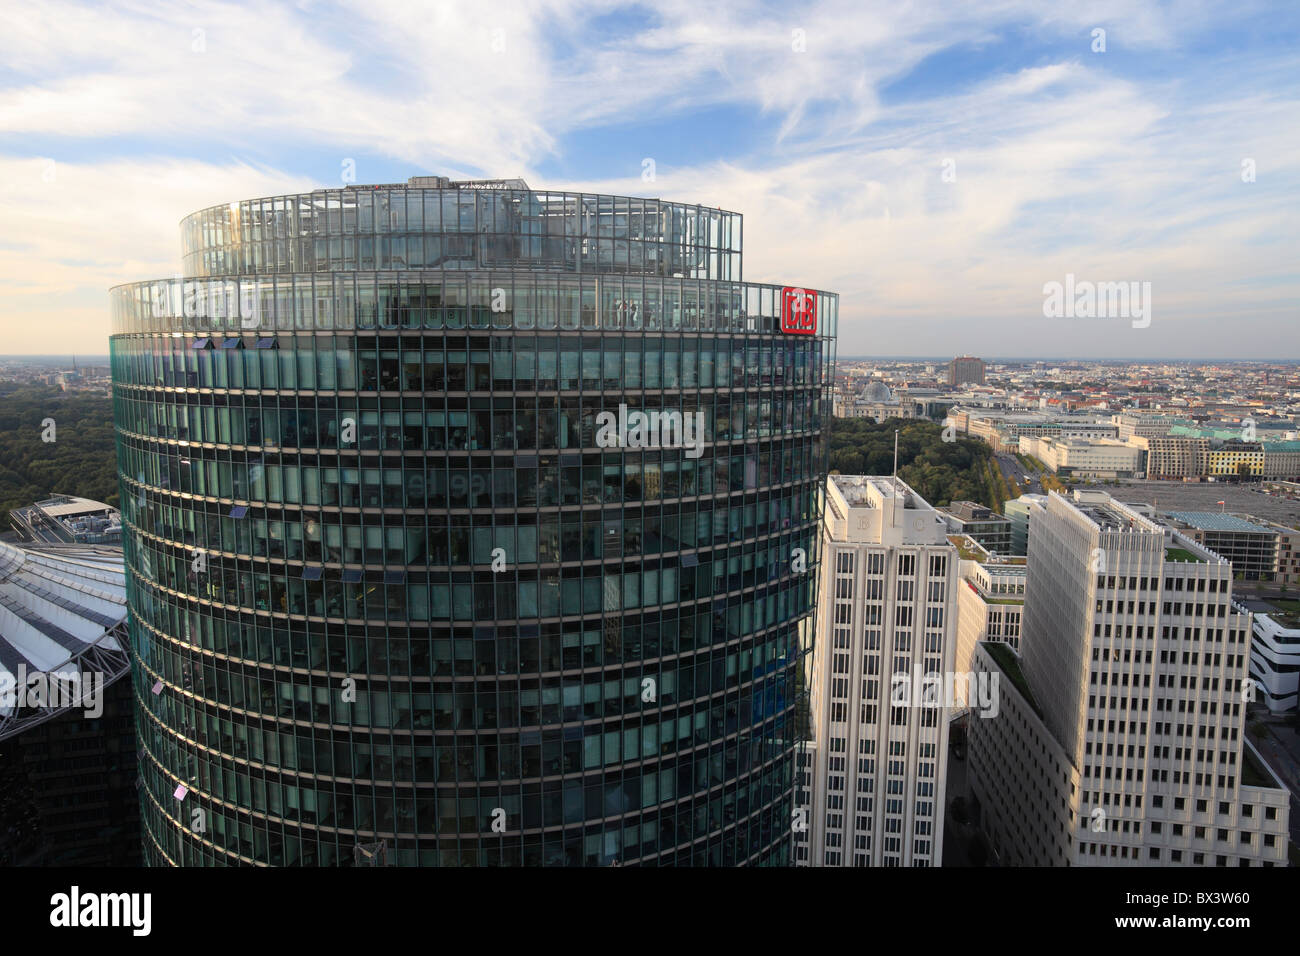 Bürogebäude Deutsche Bahn Tower in Berlin Stockbild